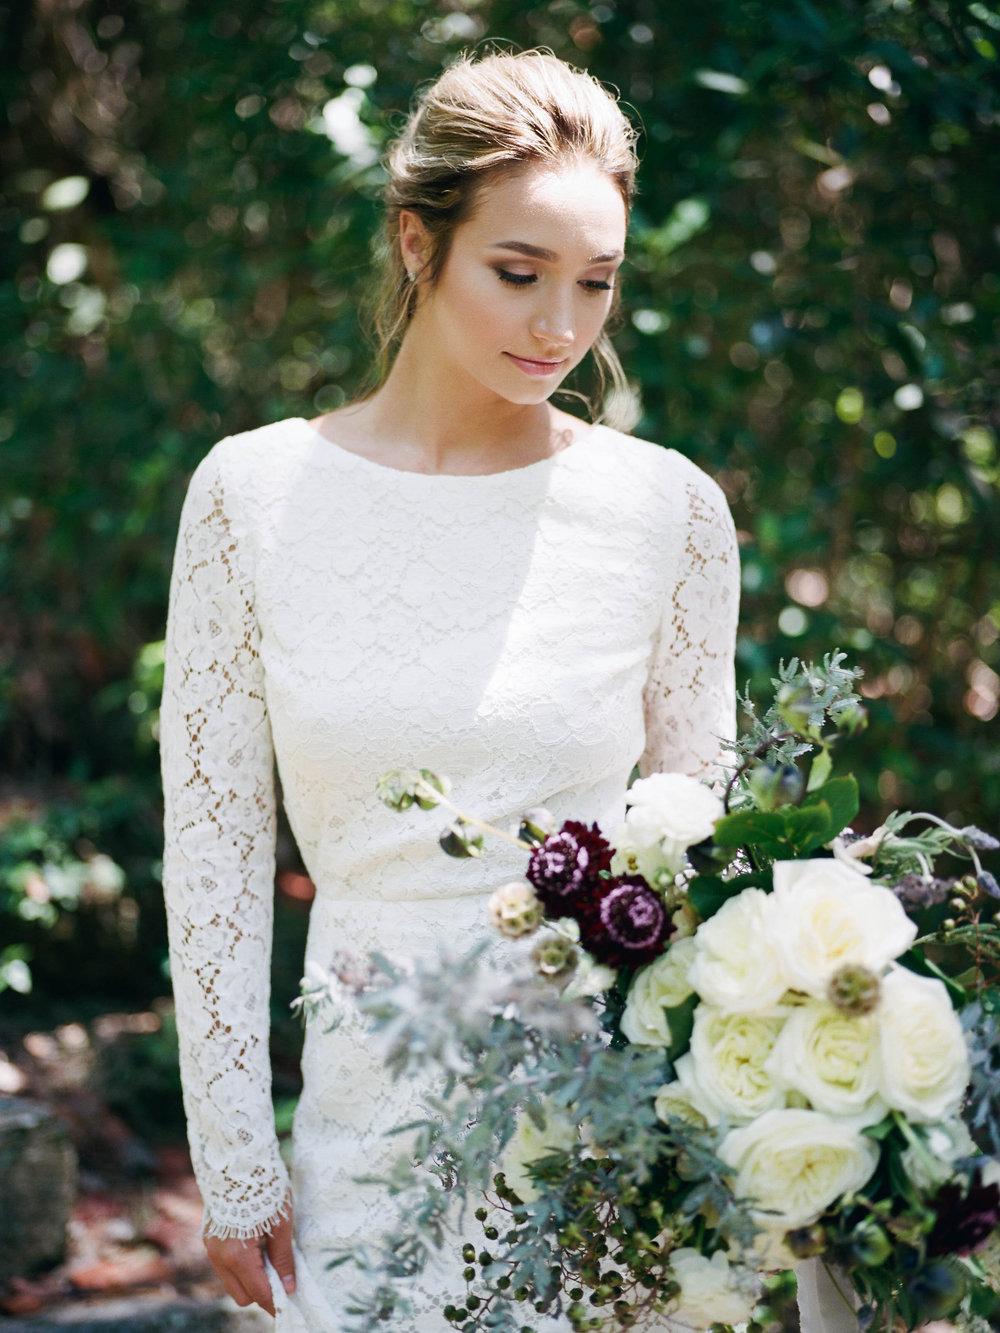 REGreynoldsPark-EdellePhotography-WeddingPhotographer-138.jpg